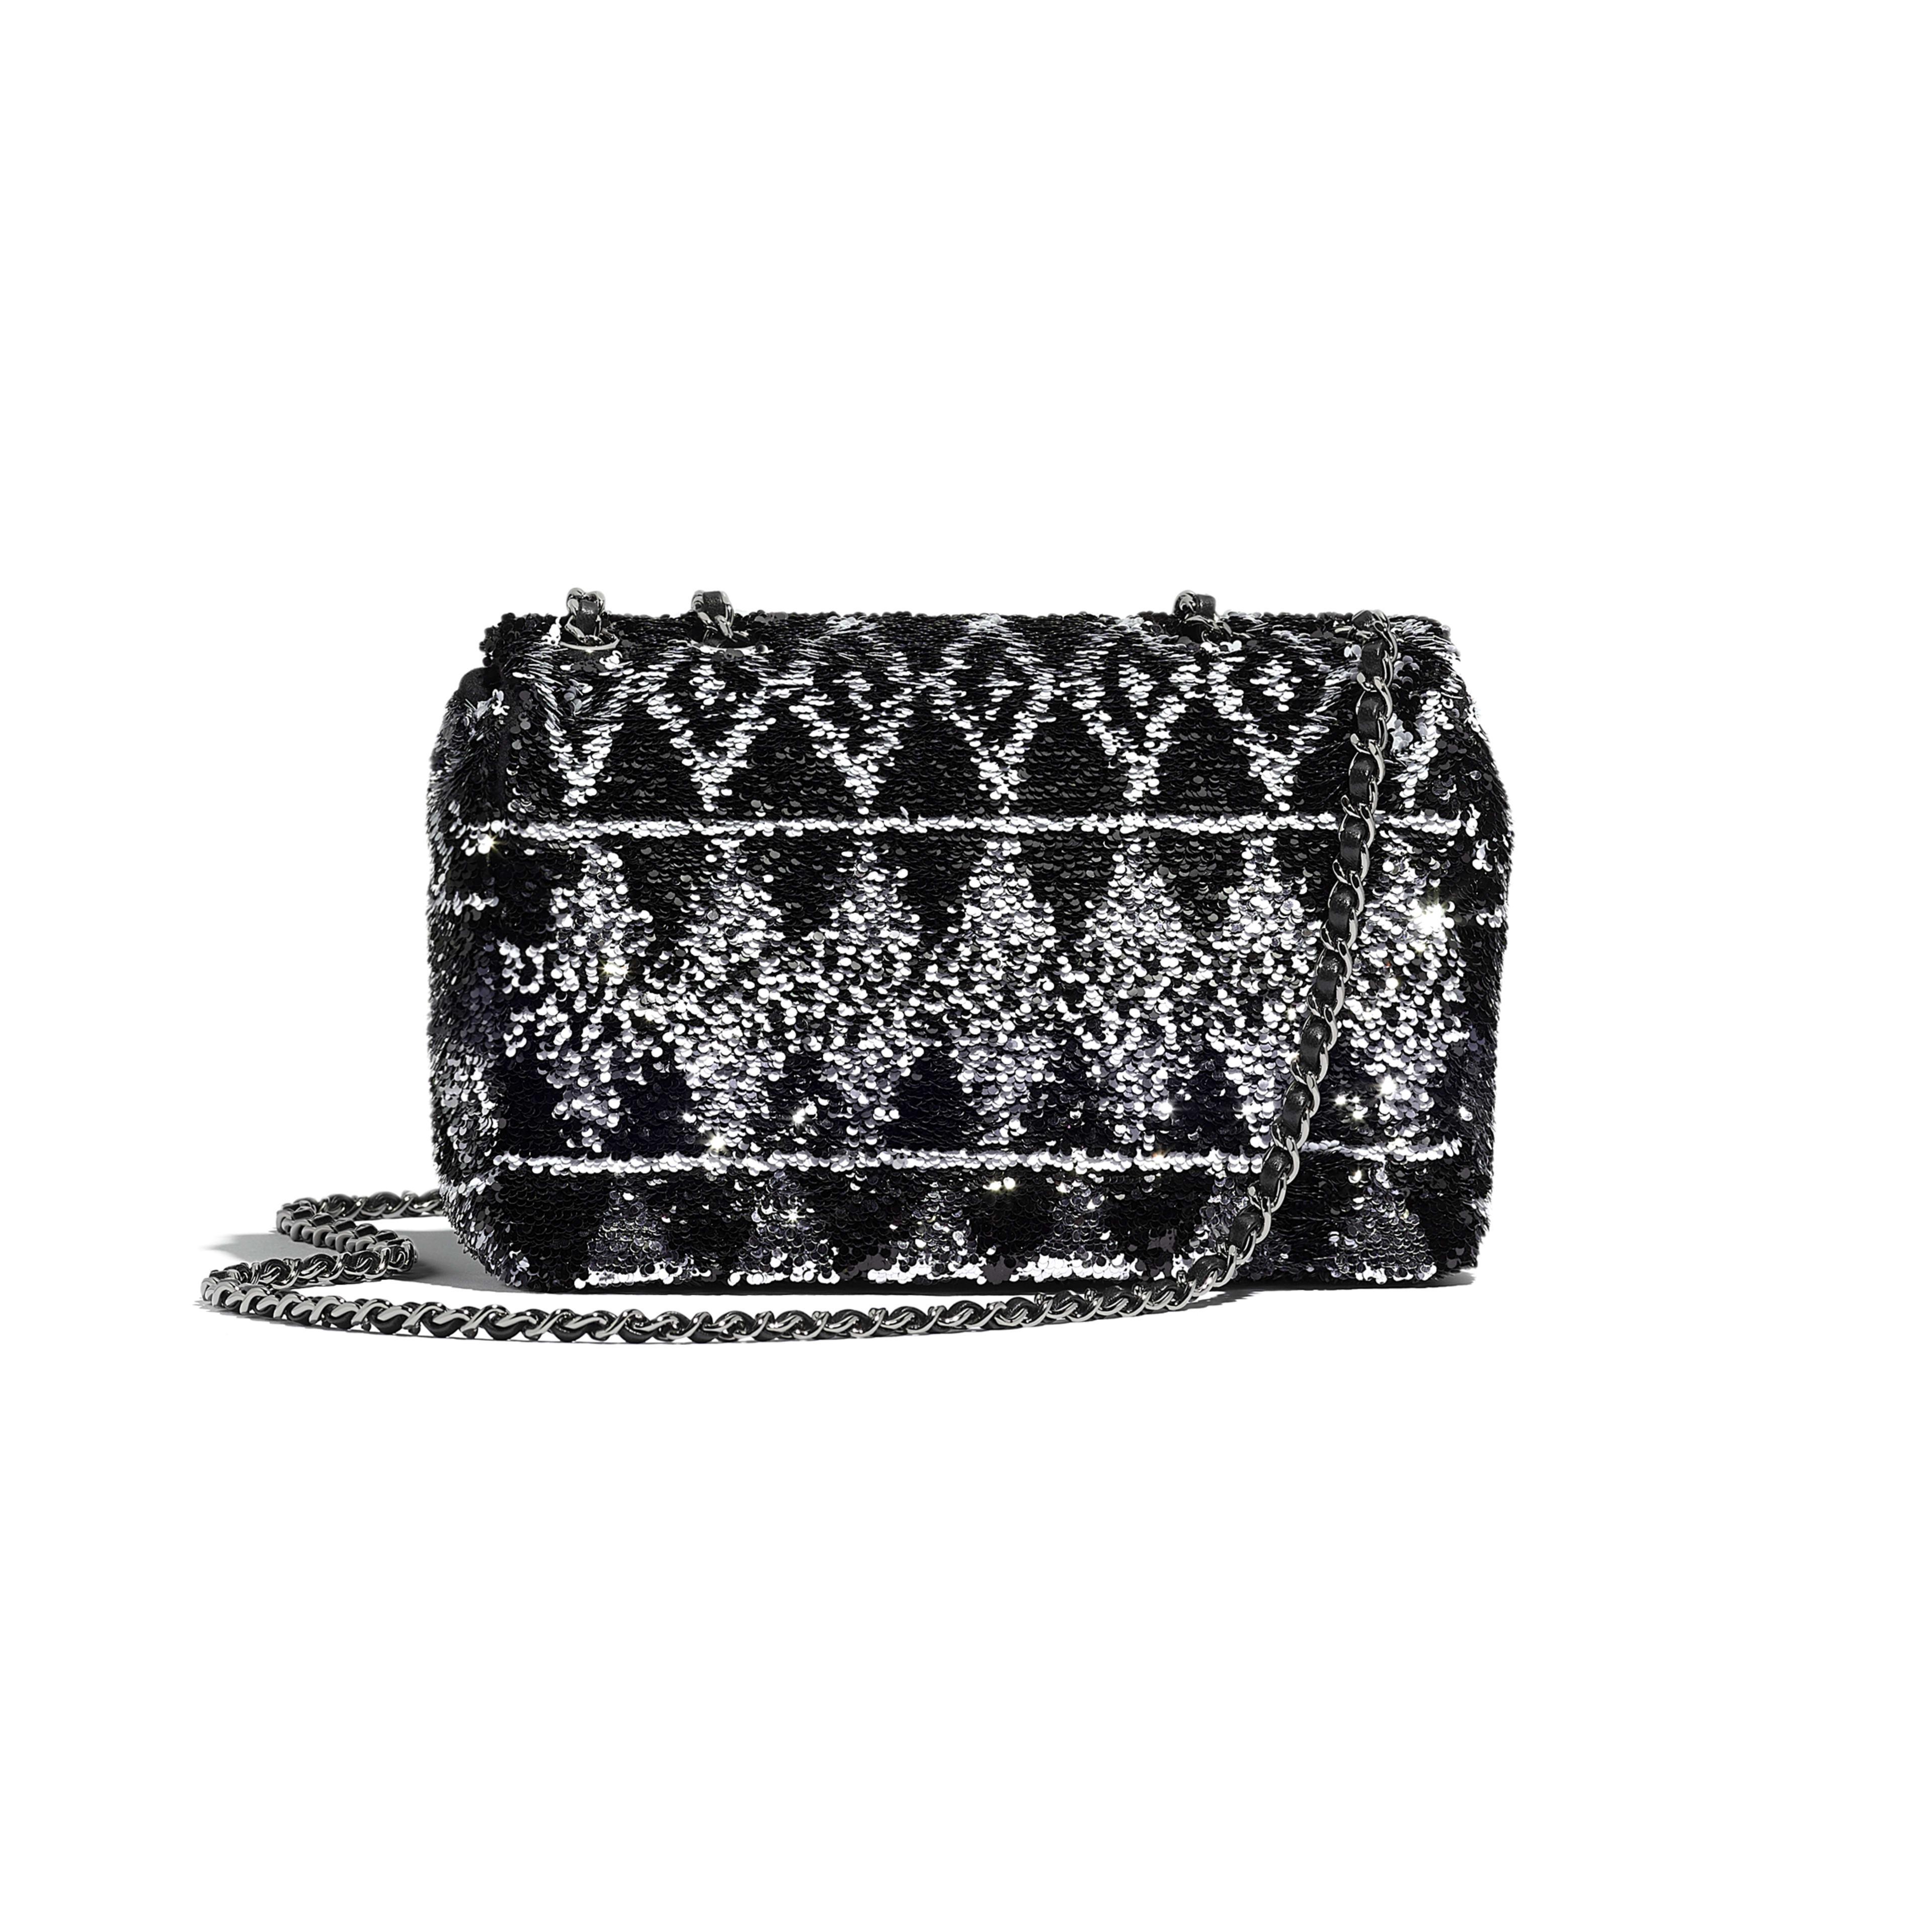 Flap Bag - Silver & Black - Sequins & Ruthenium-Finish Metal - Alternative view - see full sized version